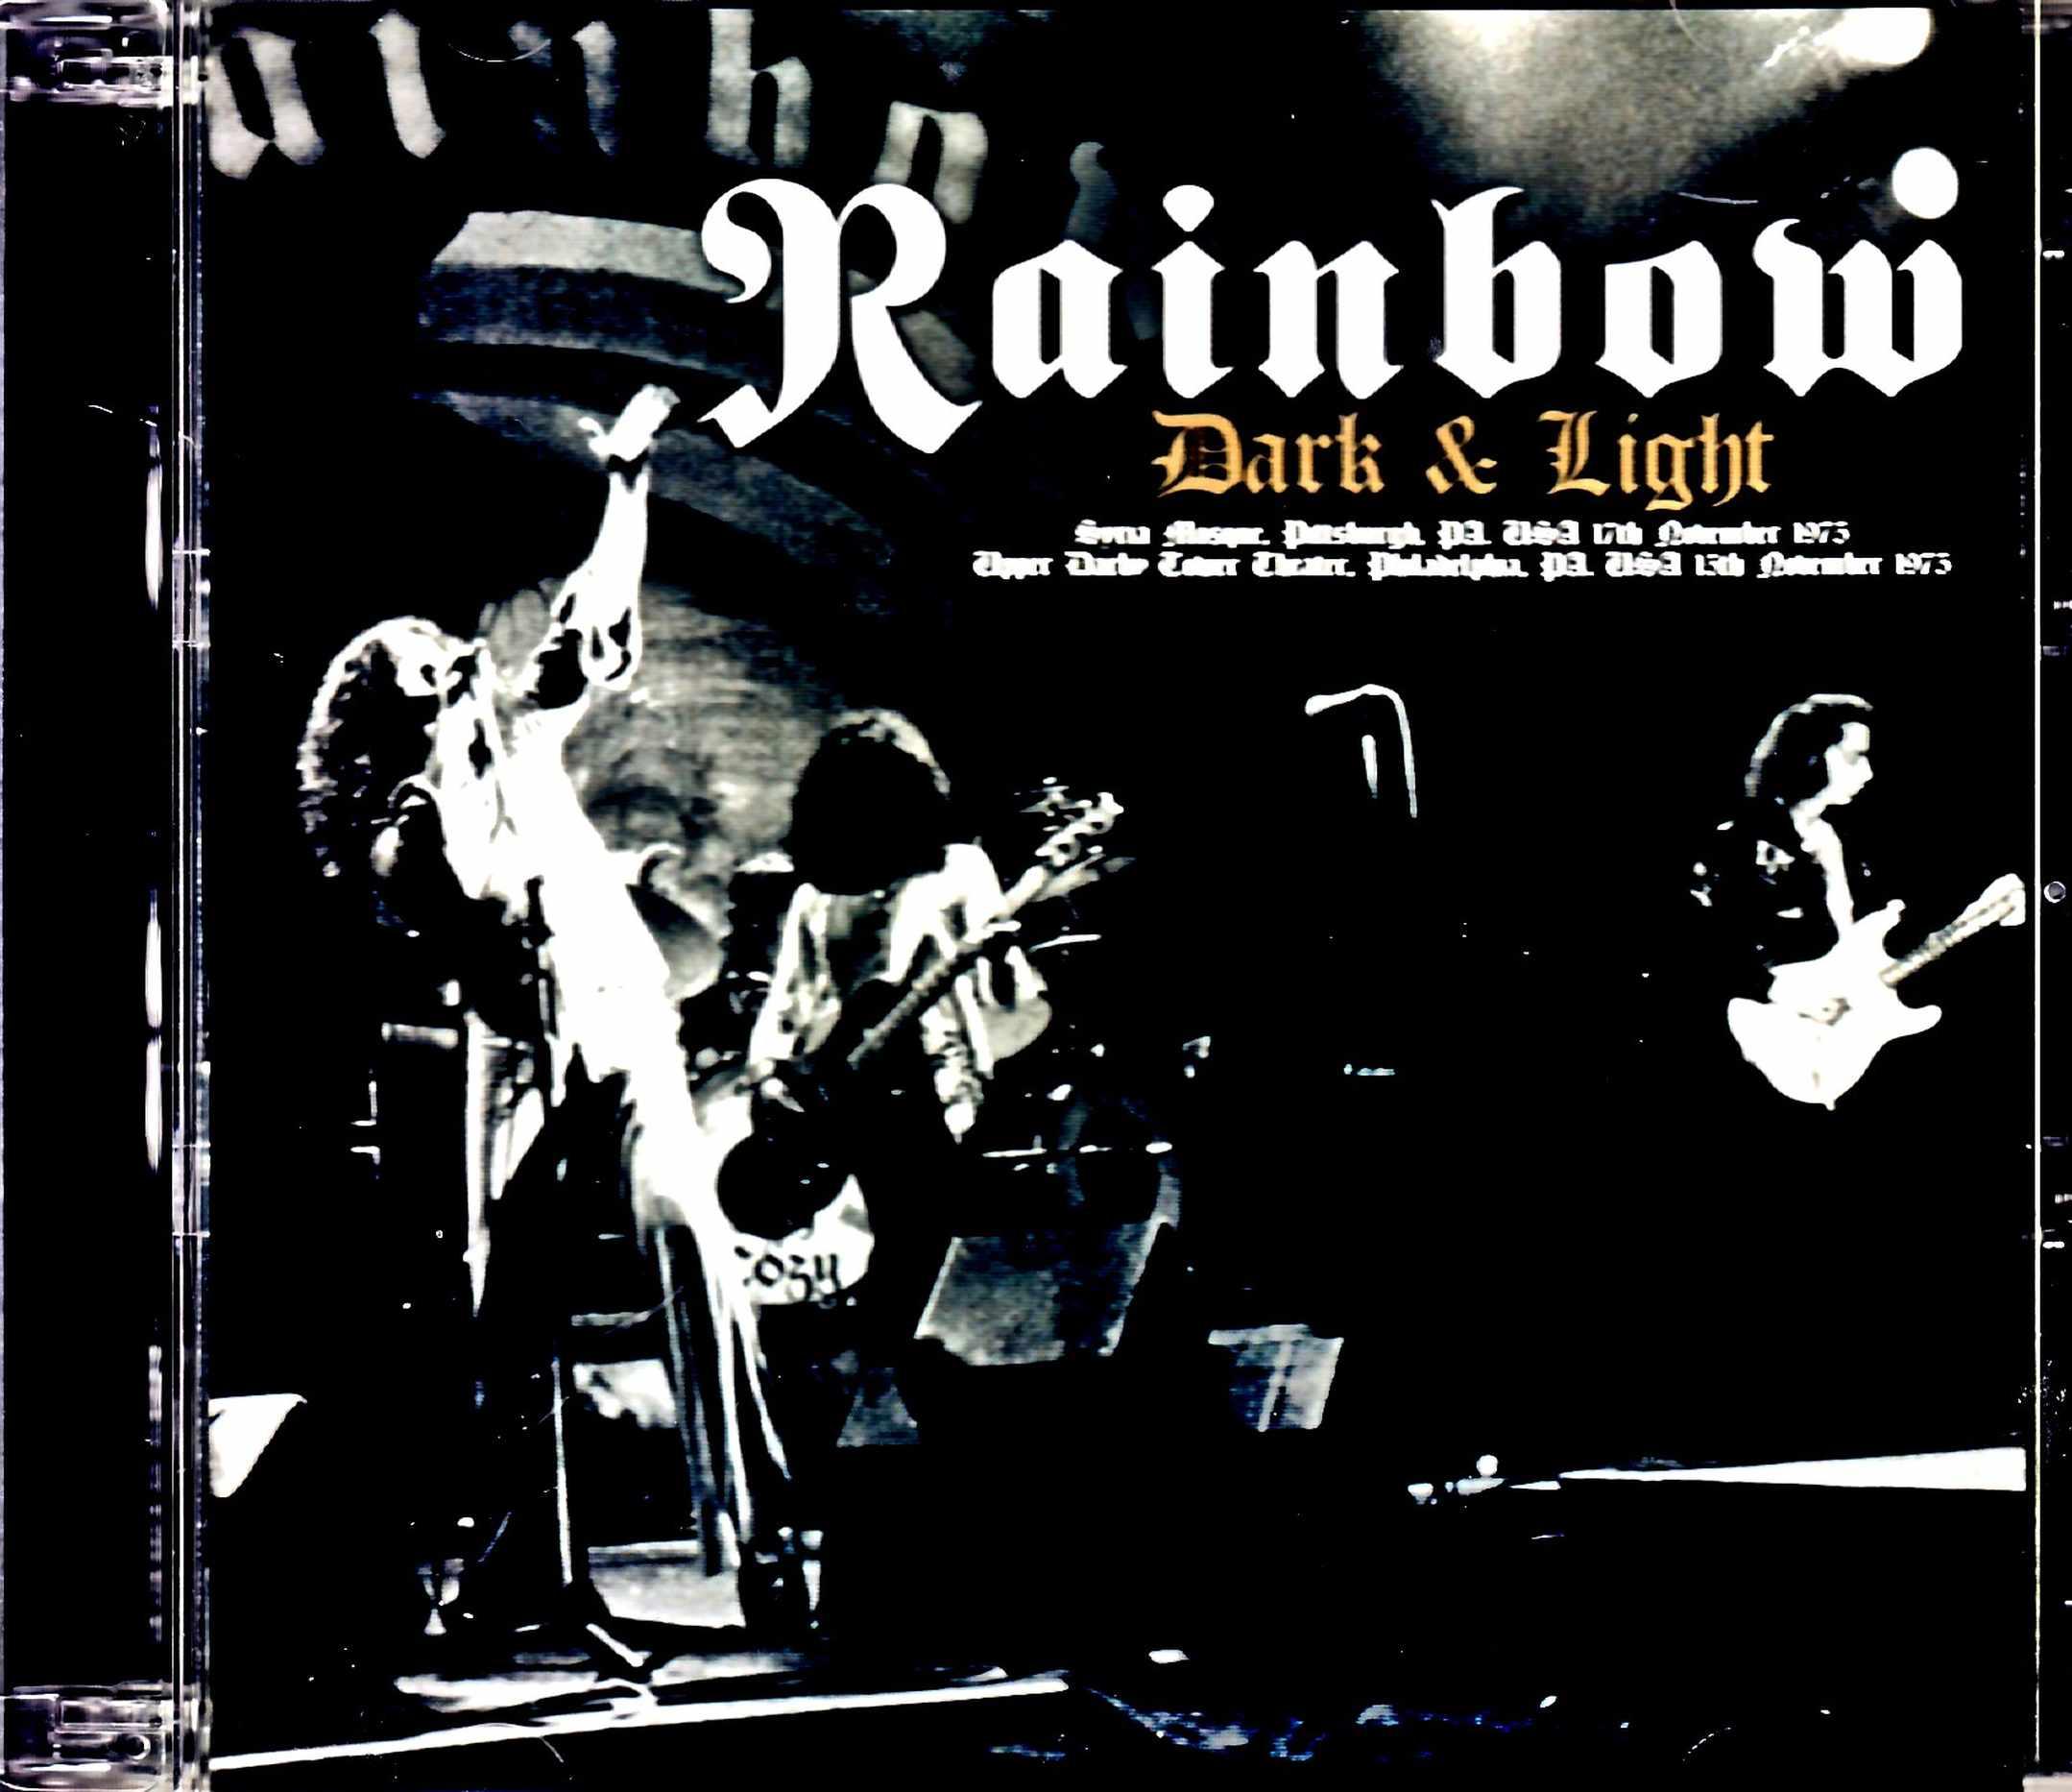 Rainbow レインボー/PA,USA 1975 2Days